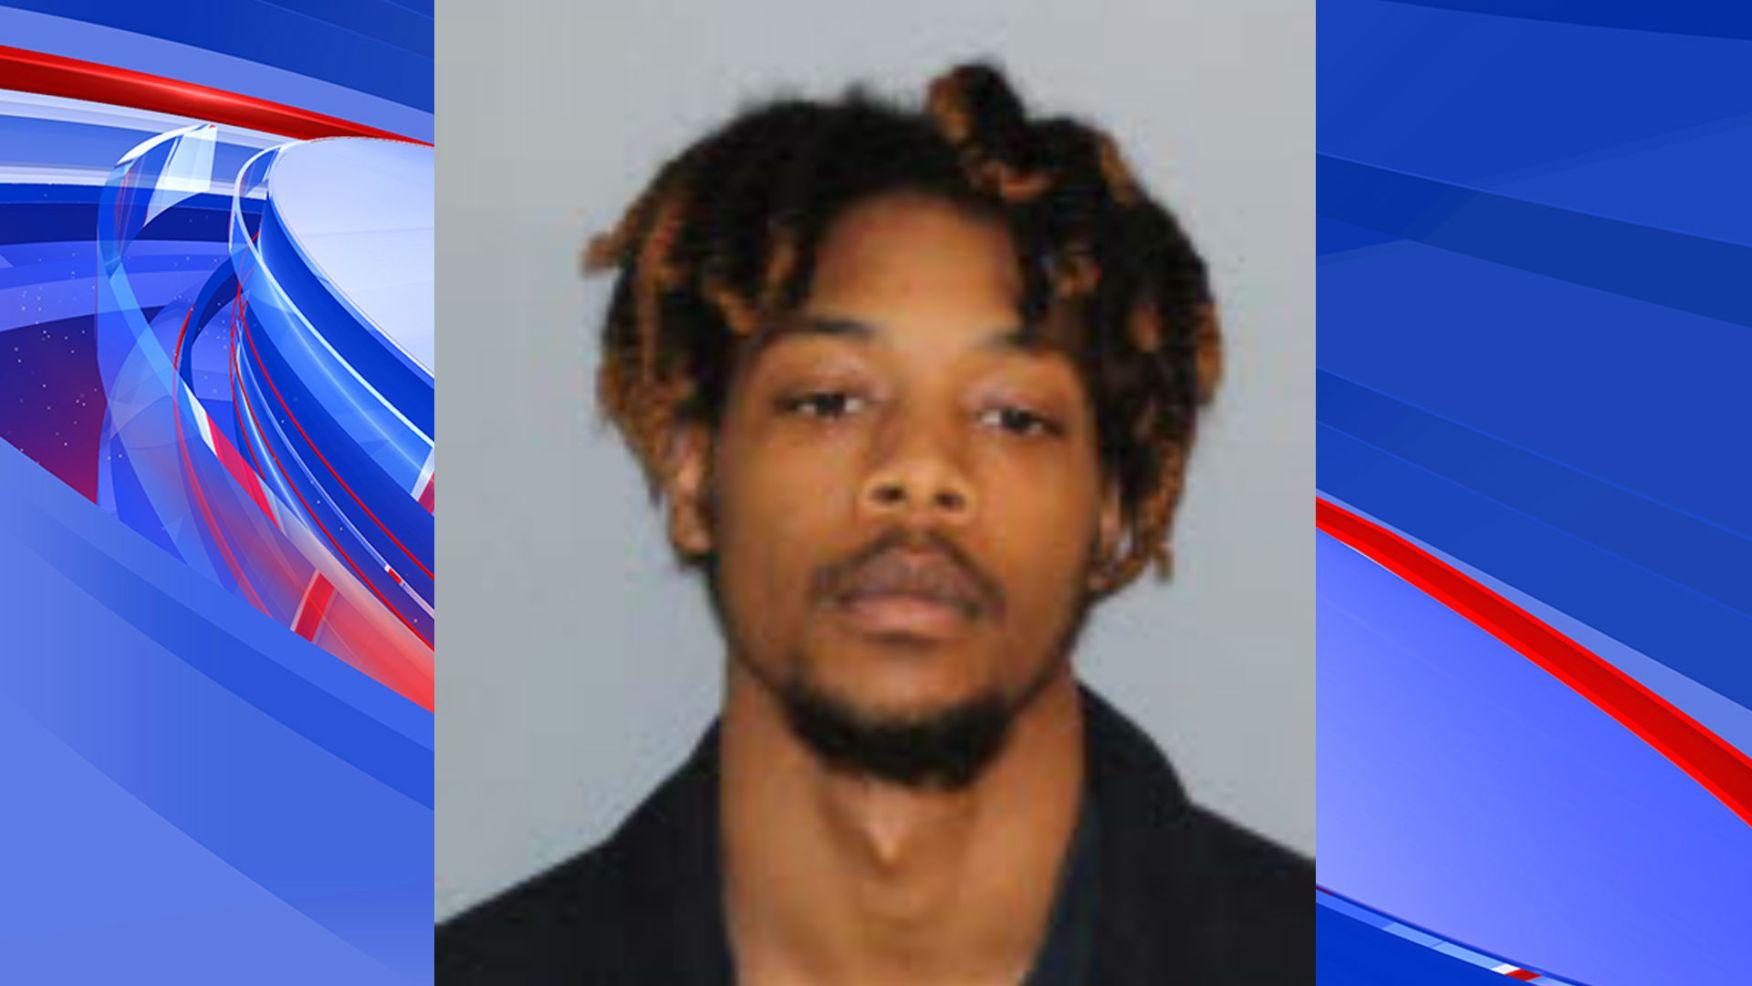 Naked wedding crasher arrested for allegedly exposing